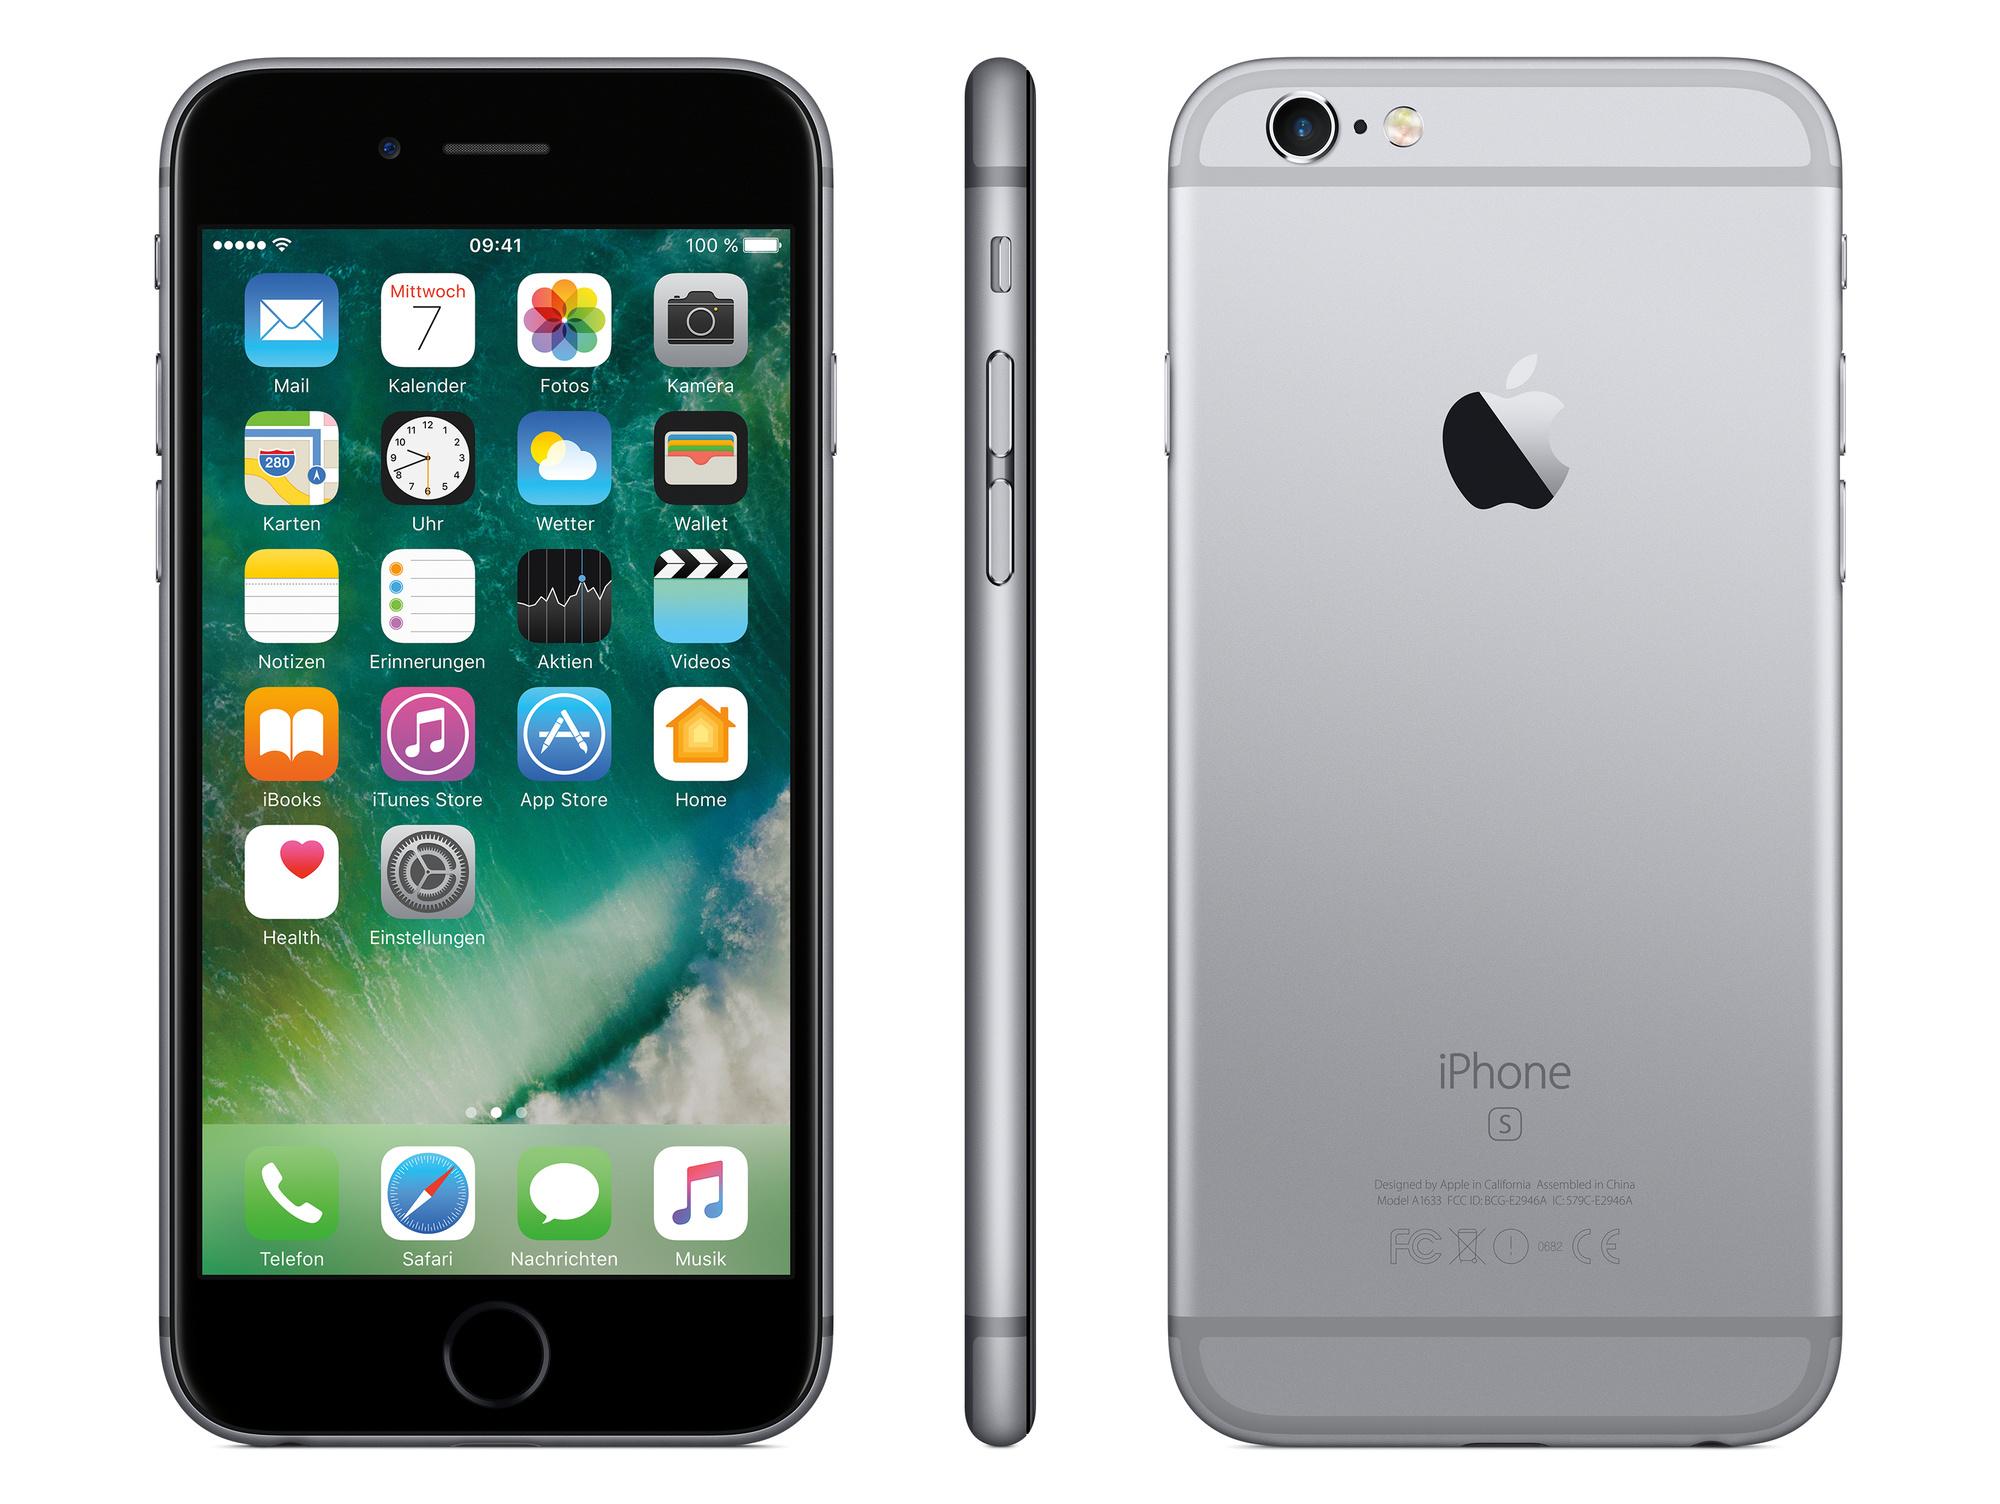 apple iphone 6s 128gb spacegrau schwarz ielectro. Black Bedroom Furniture Sets. Home Design Ideas